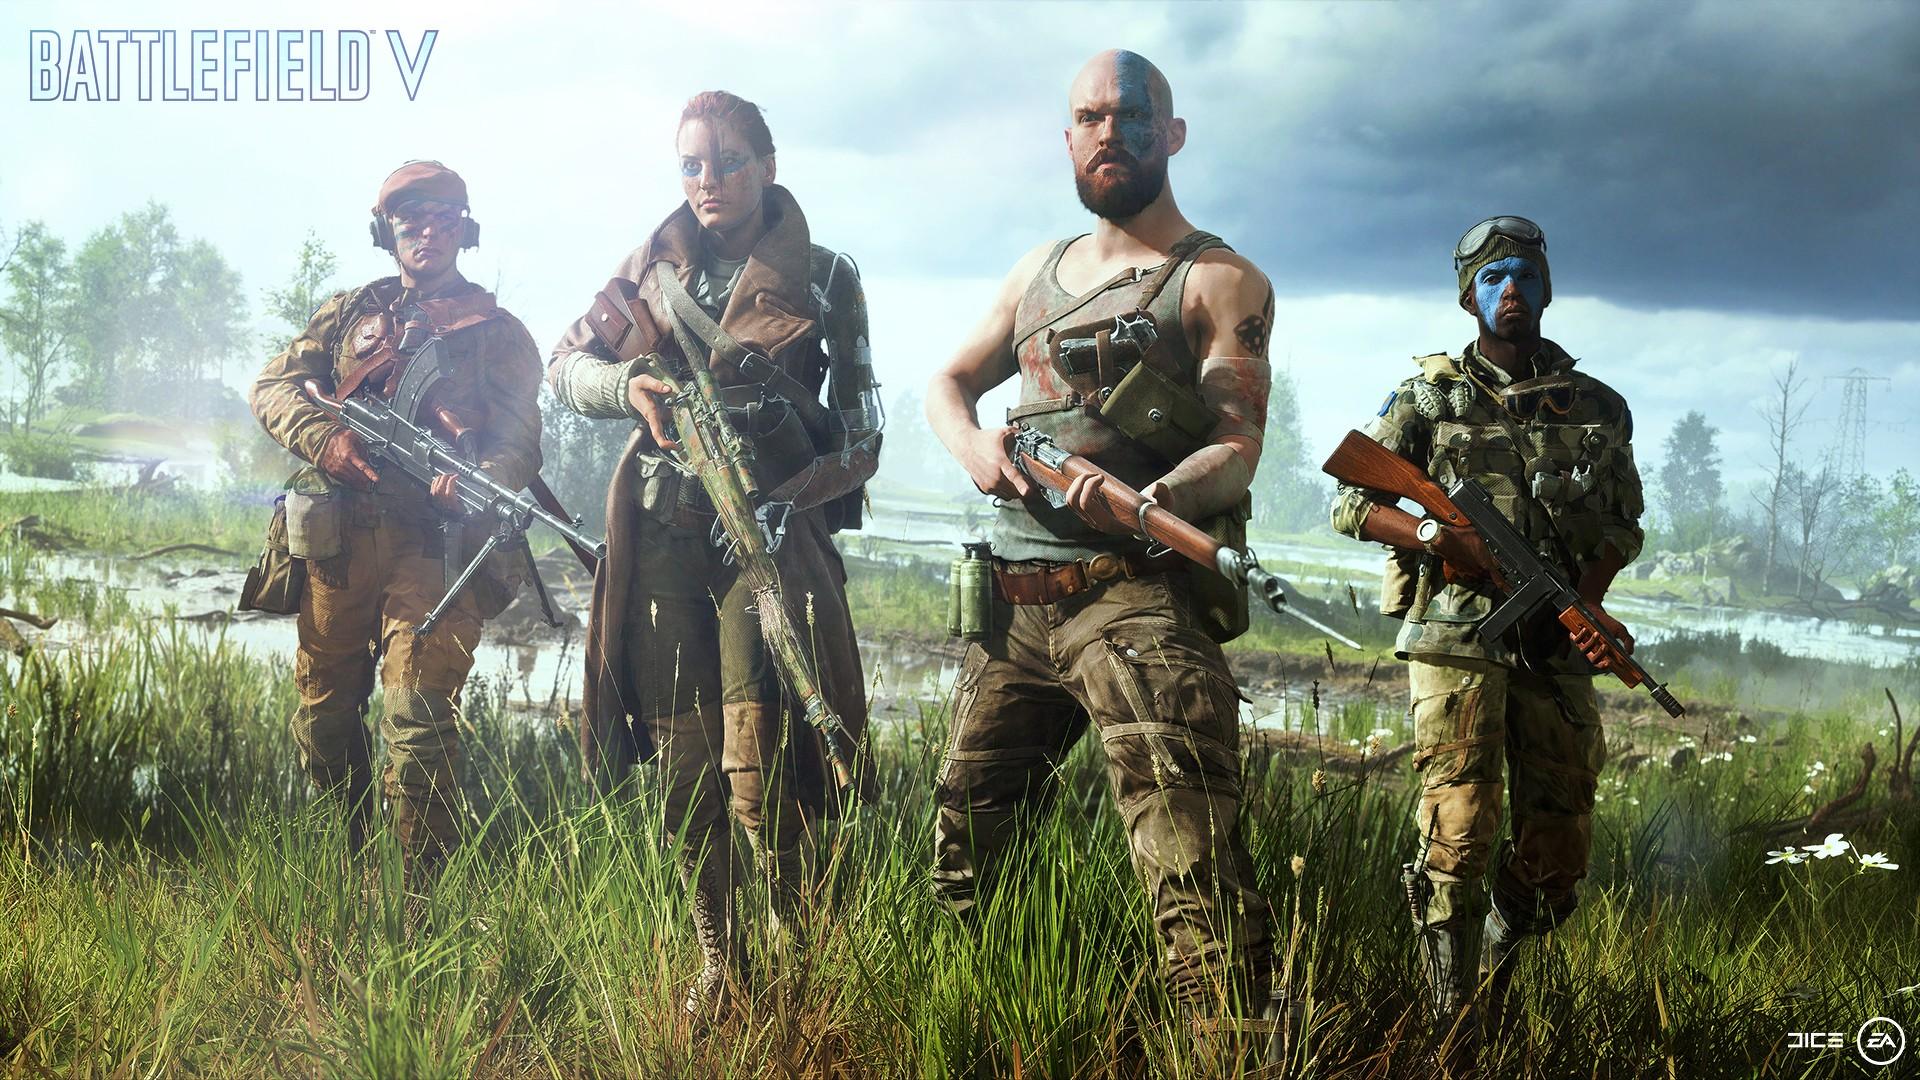 Battlefield V | خرید سی دی کی و نسخه اورجینال بازی - ایران استیم